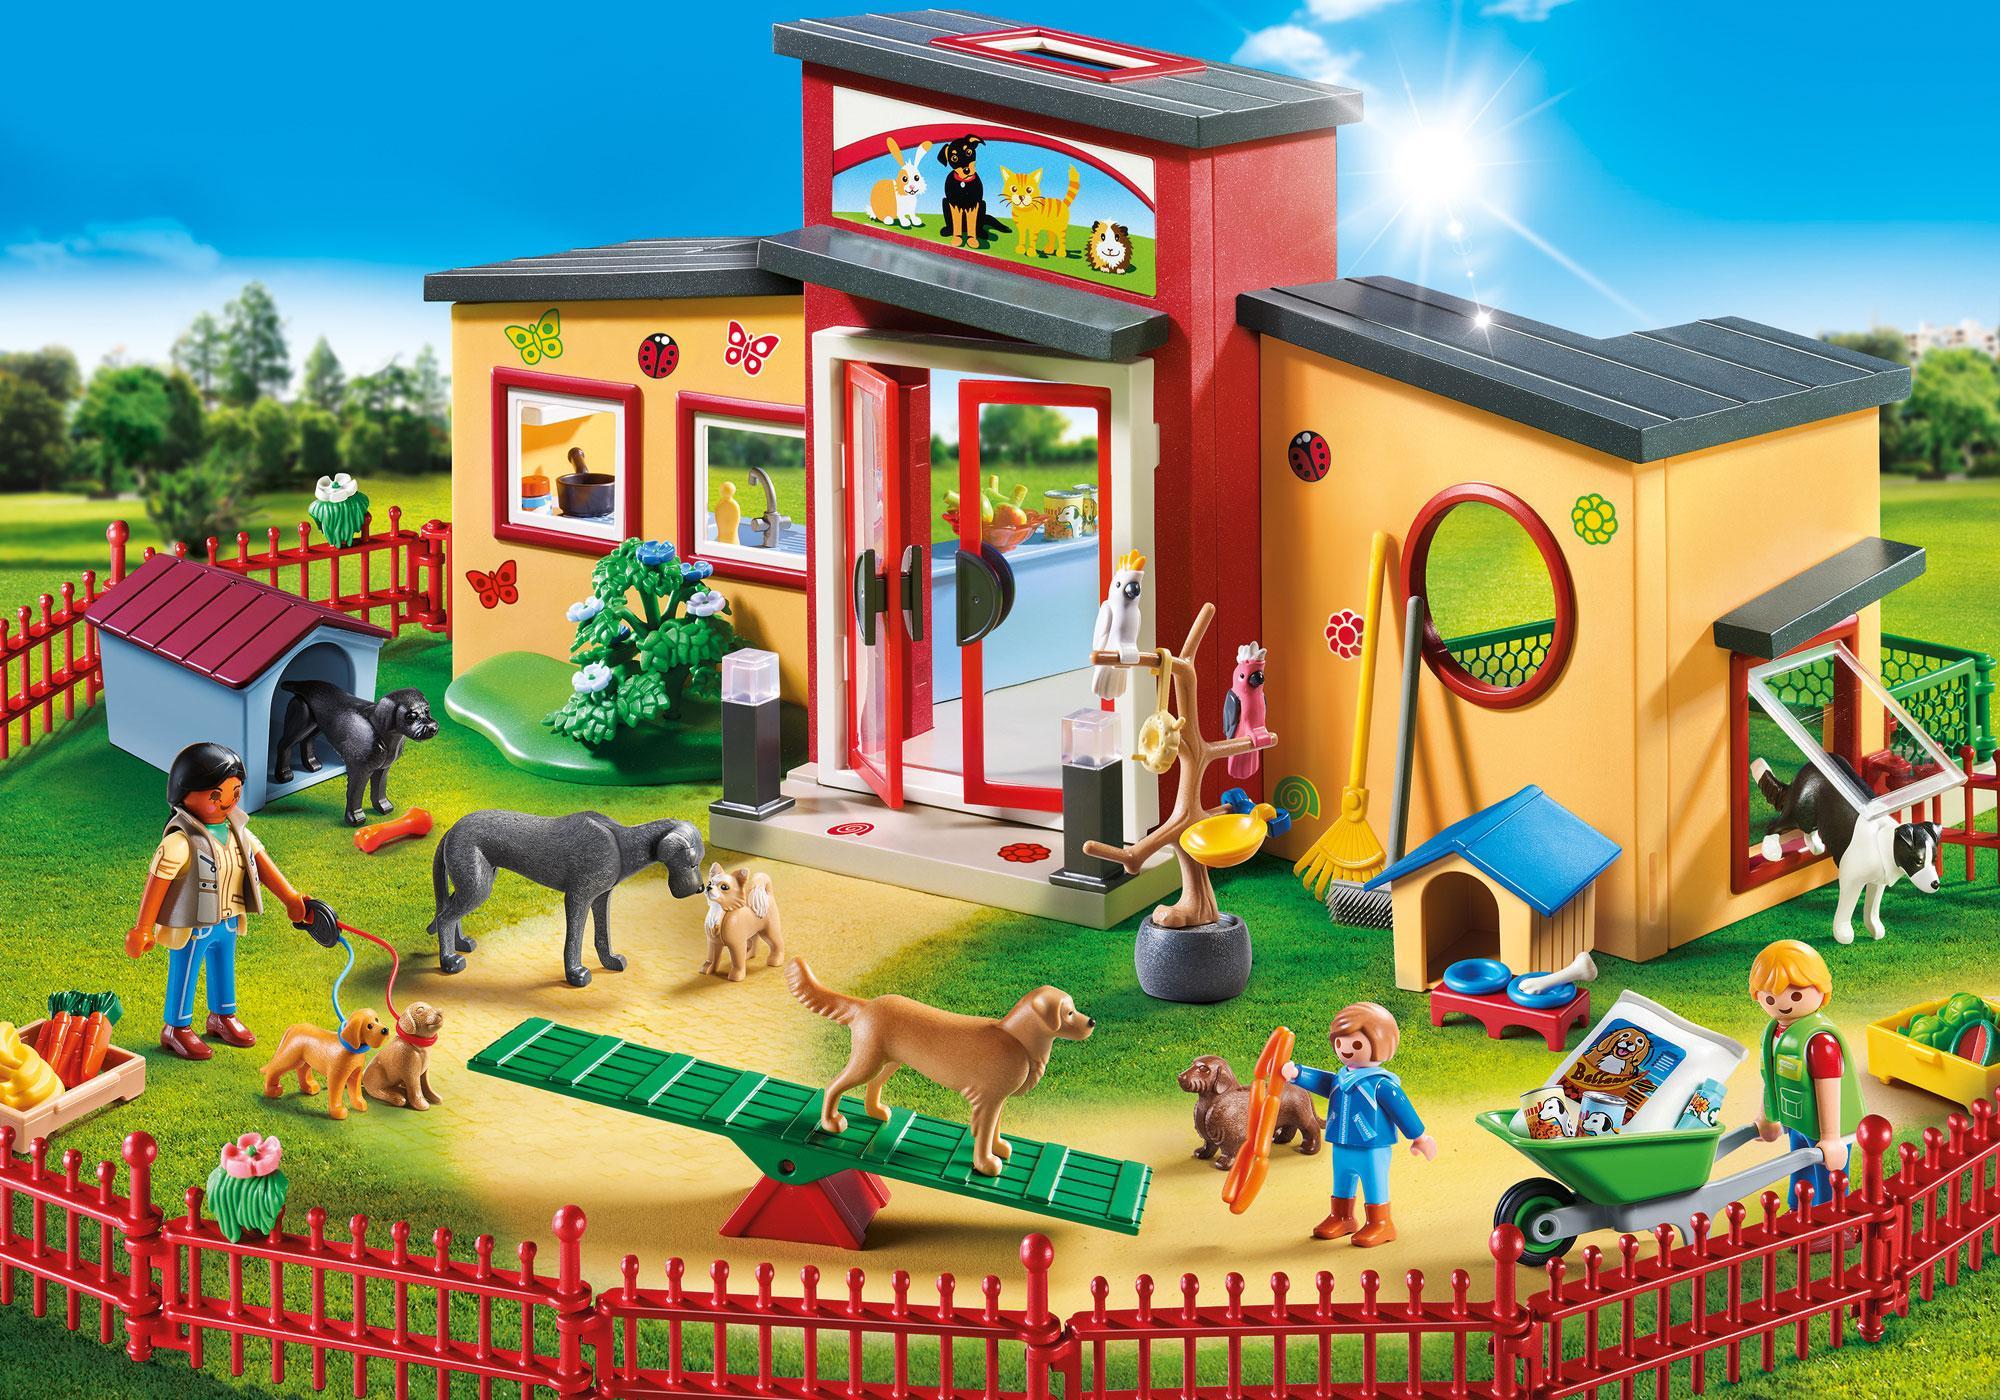 http://media.playmobil.com/i/playmobil/9275_product_detail/Tiny Paws Pet Hotel